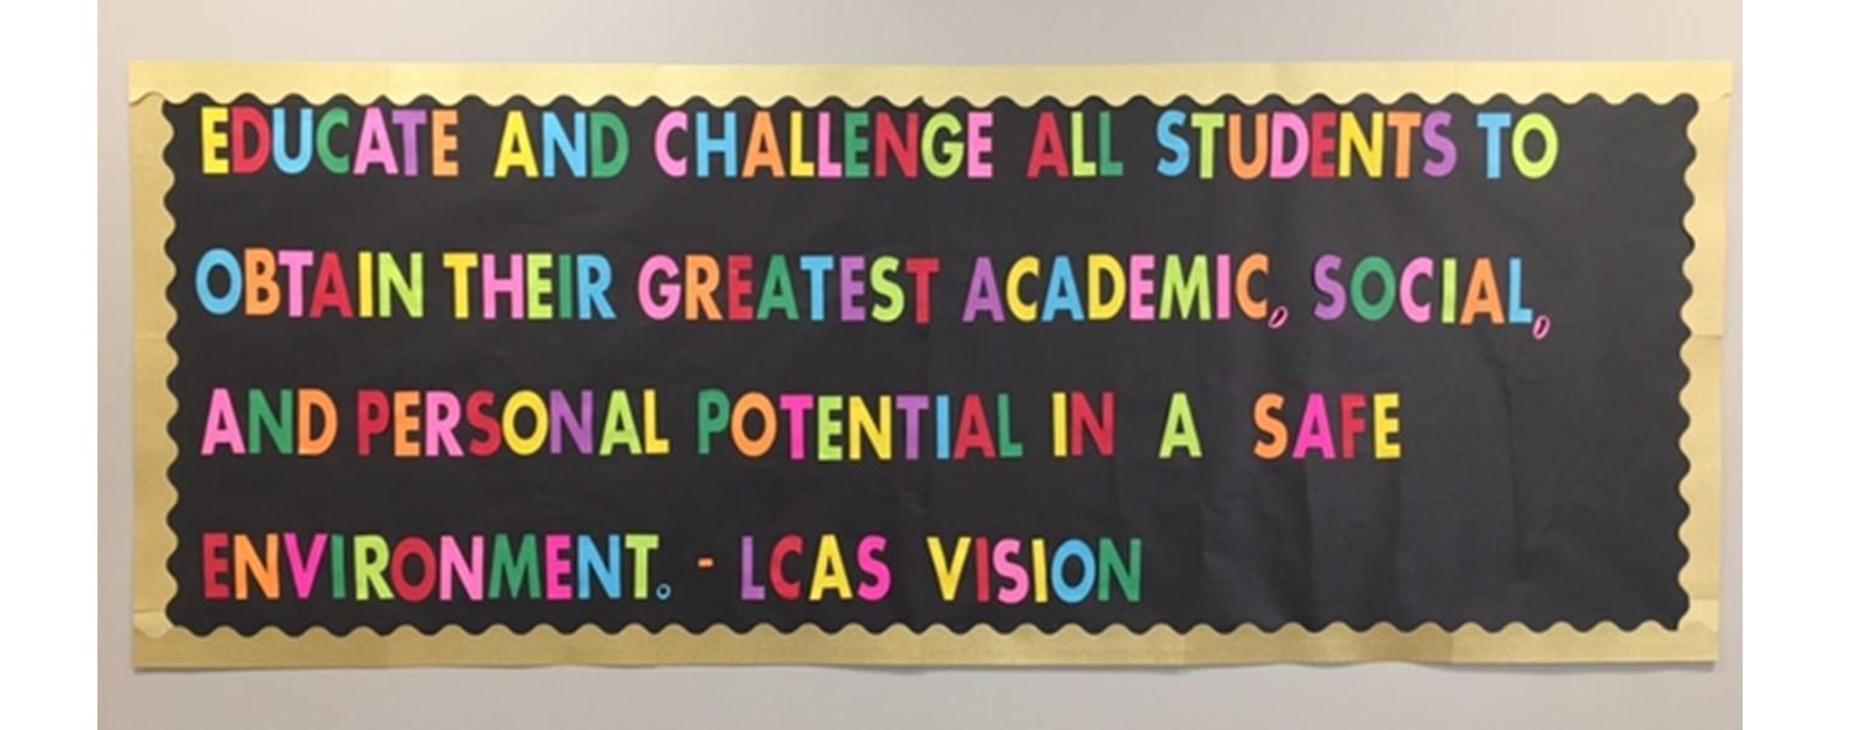 LCAS Vision